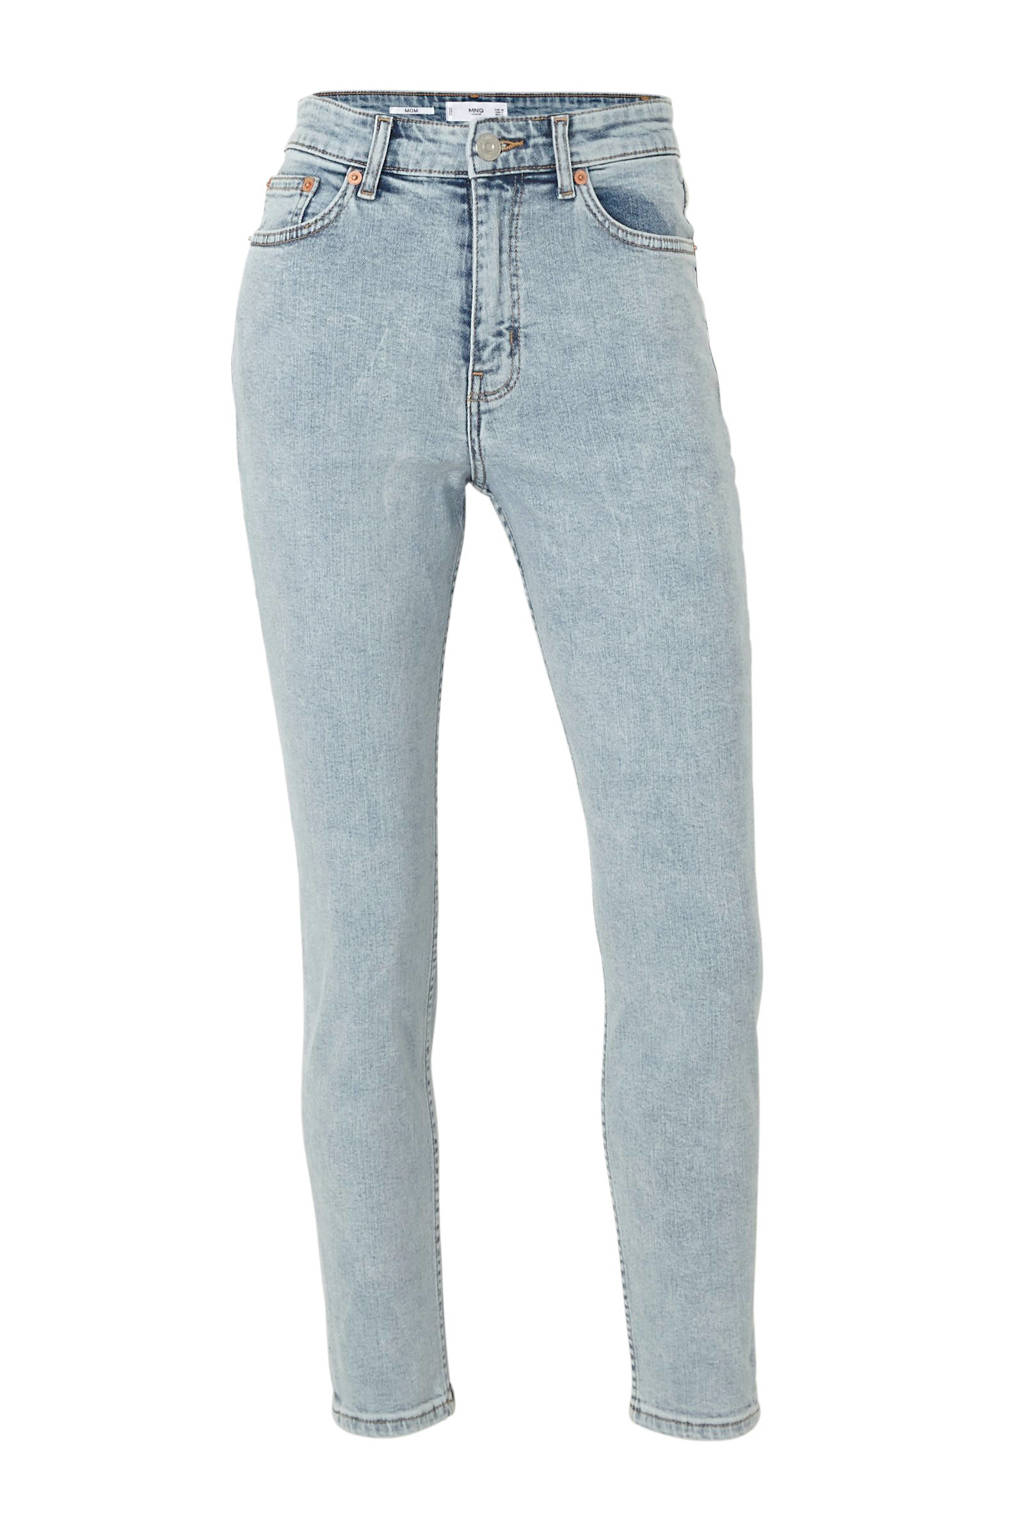 Mango high waist mom jeans, Blauw